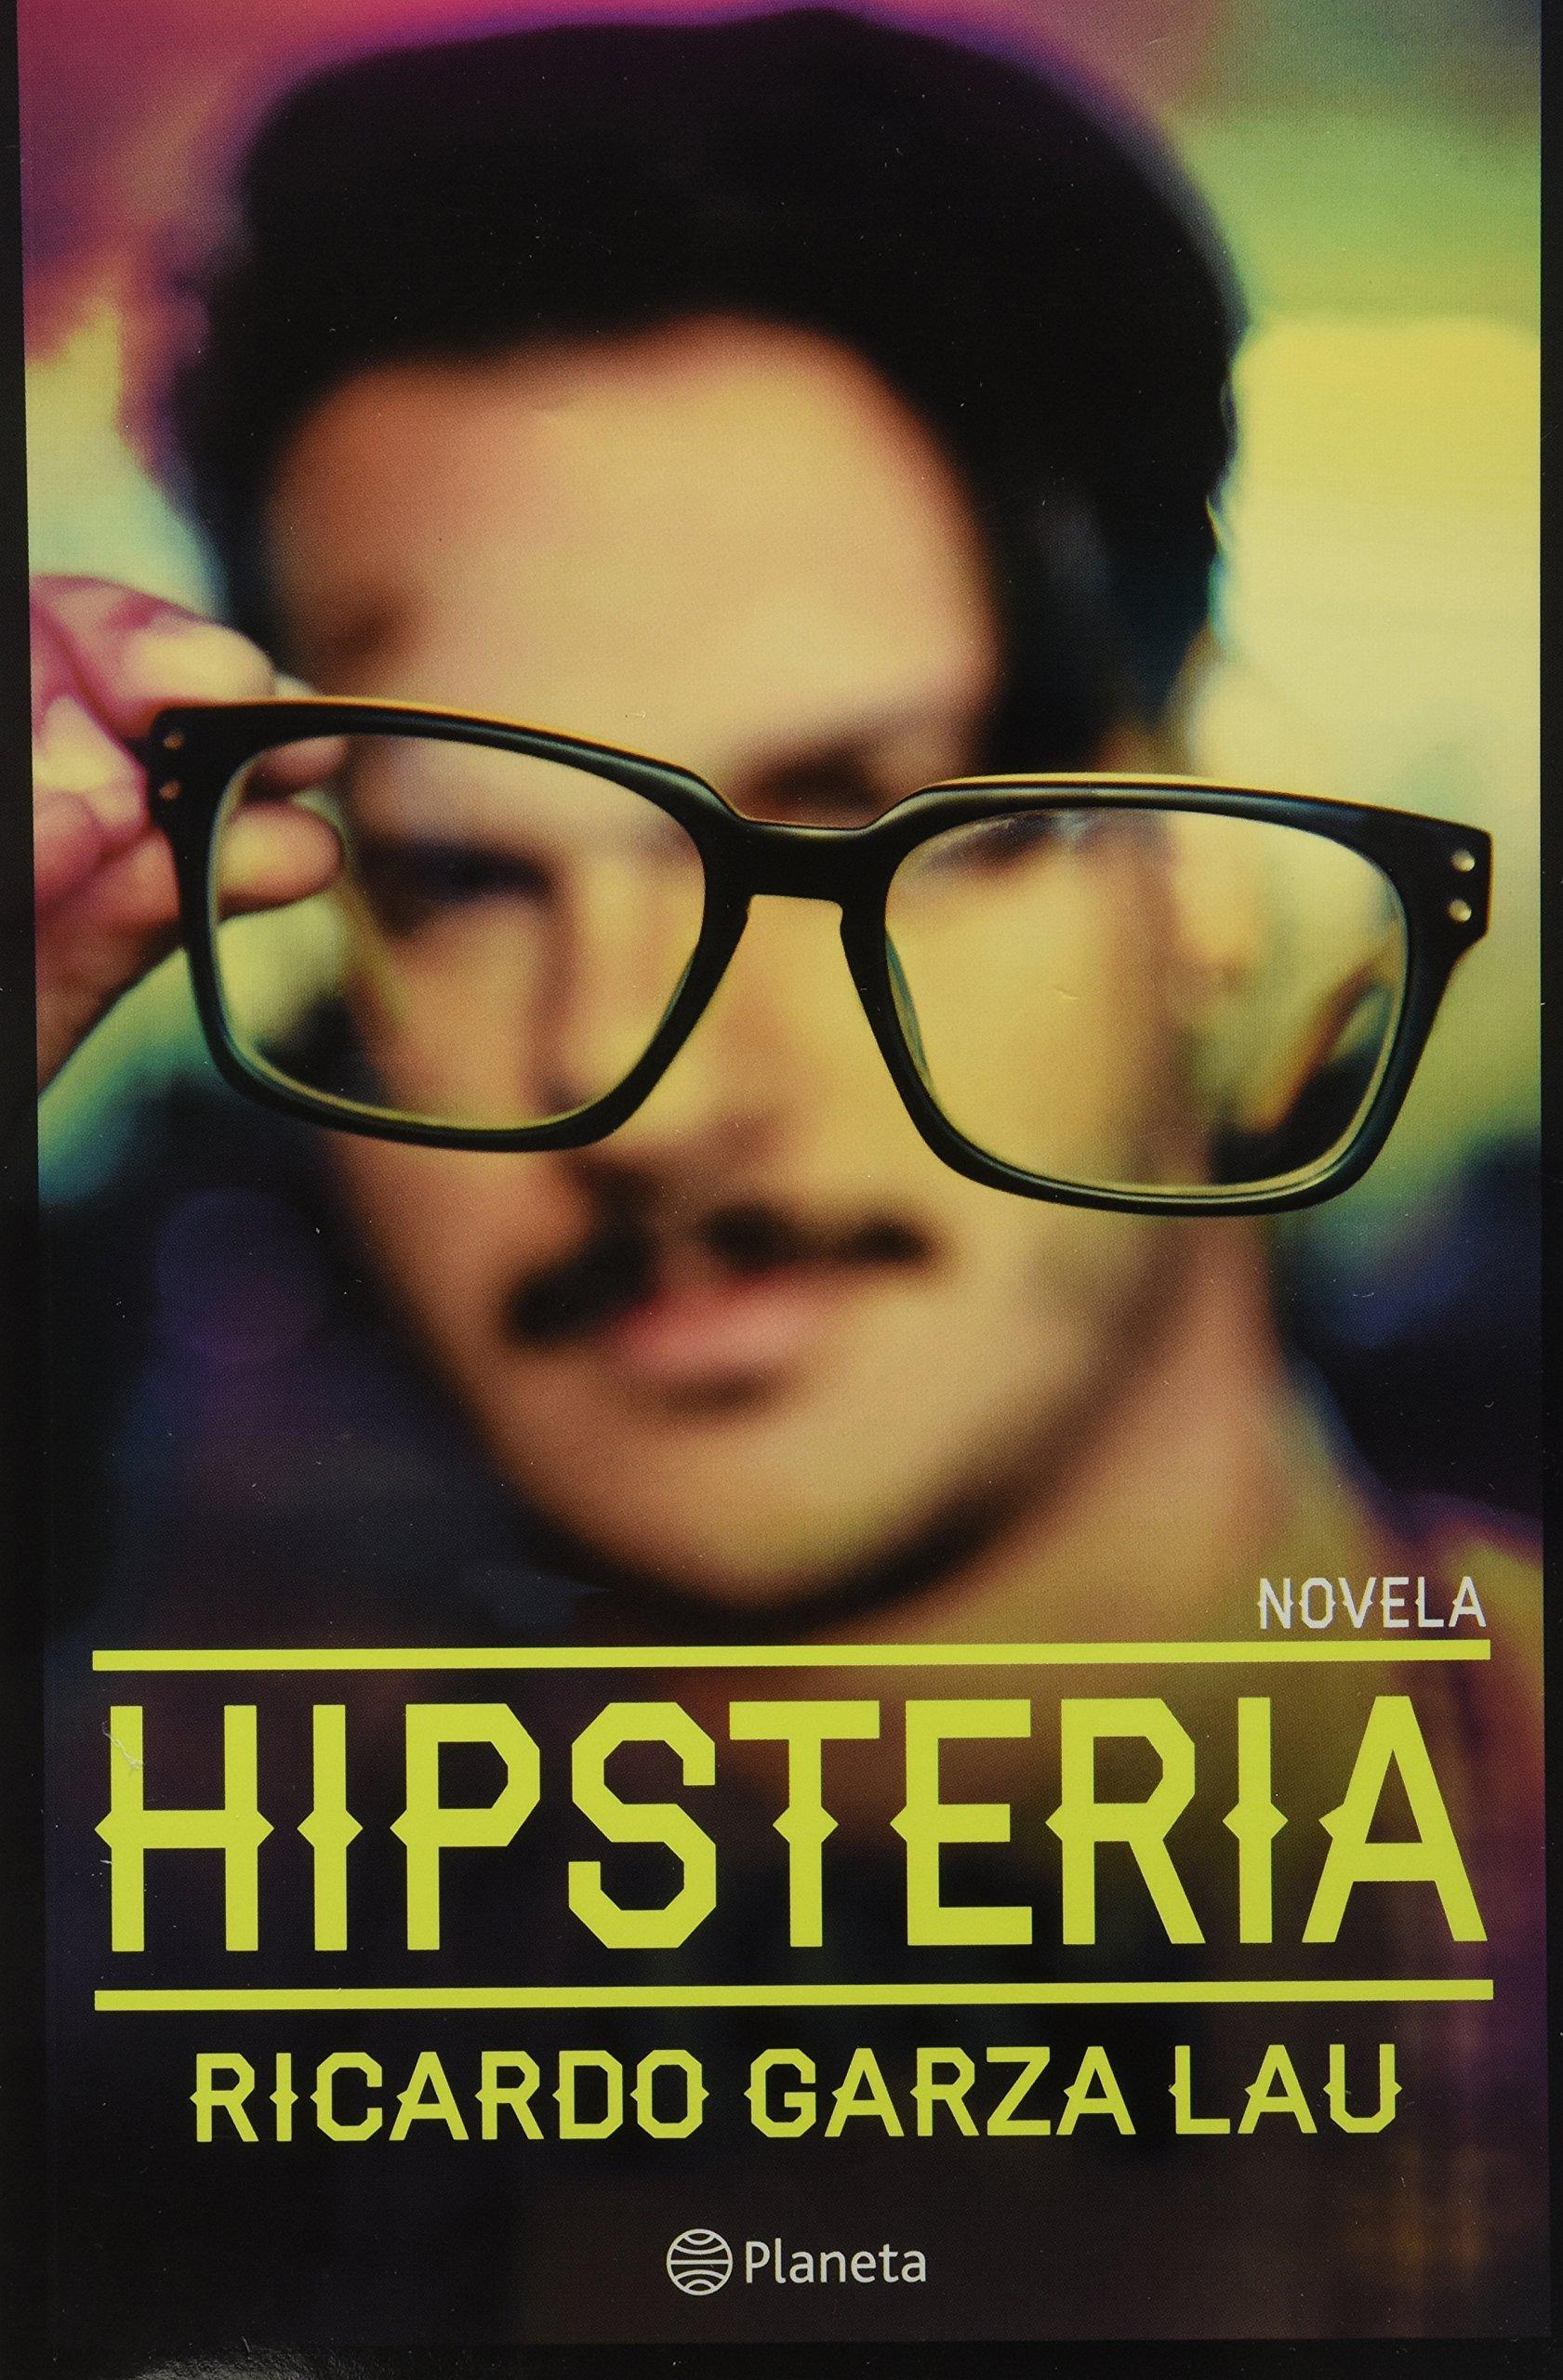 Hipsteria (Spanish Edition): Ricardo Garza: 9786070719981: Amazon.com: Books